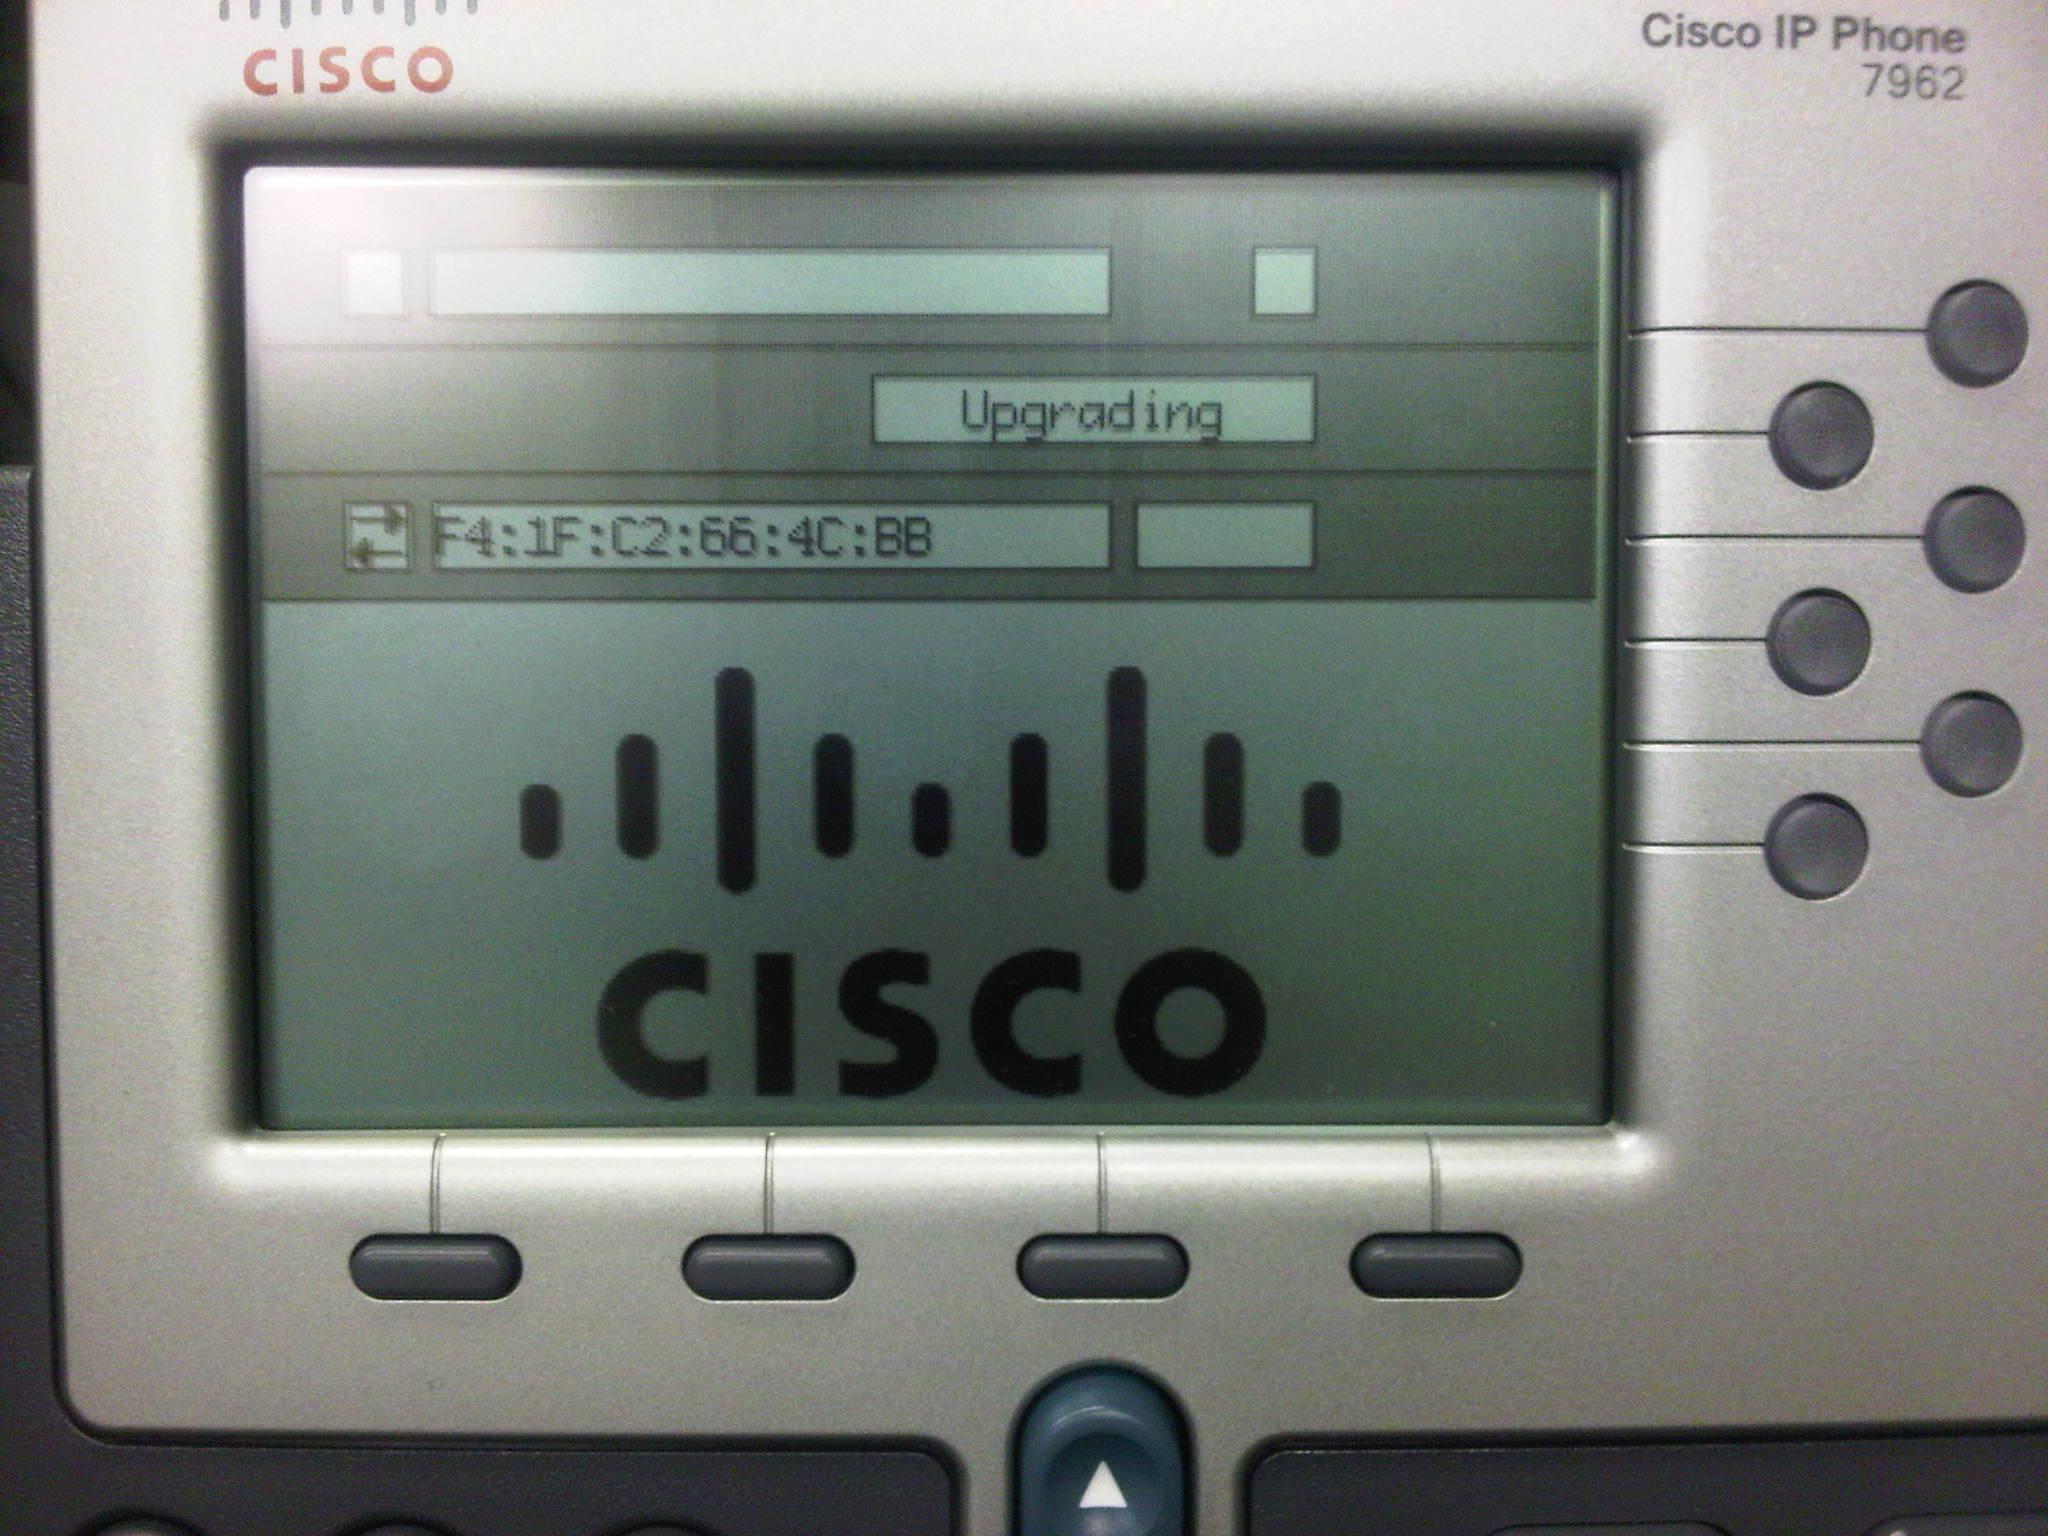 cisco ip phone 7962 firmware upgrade matrix